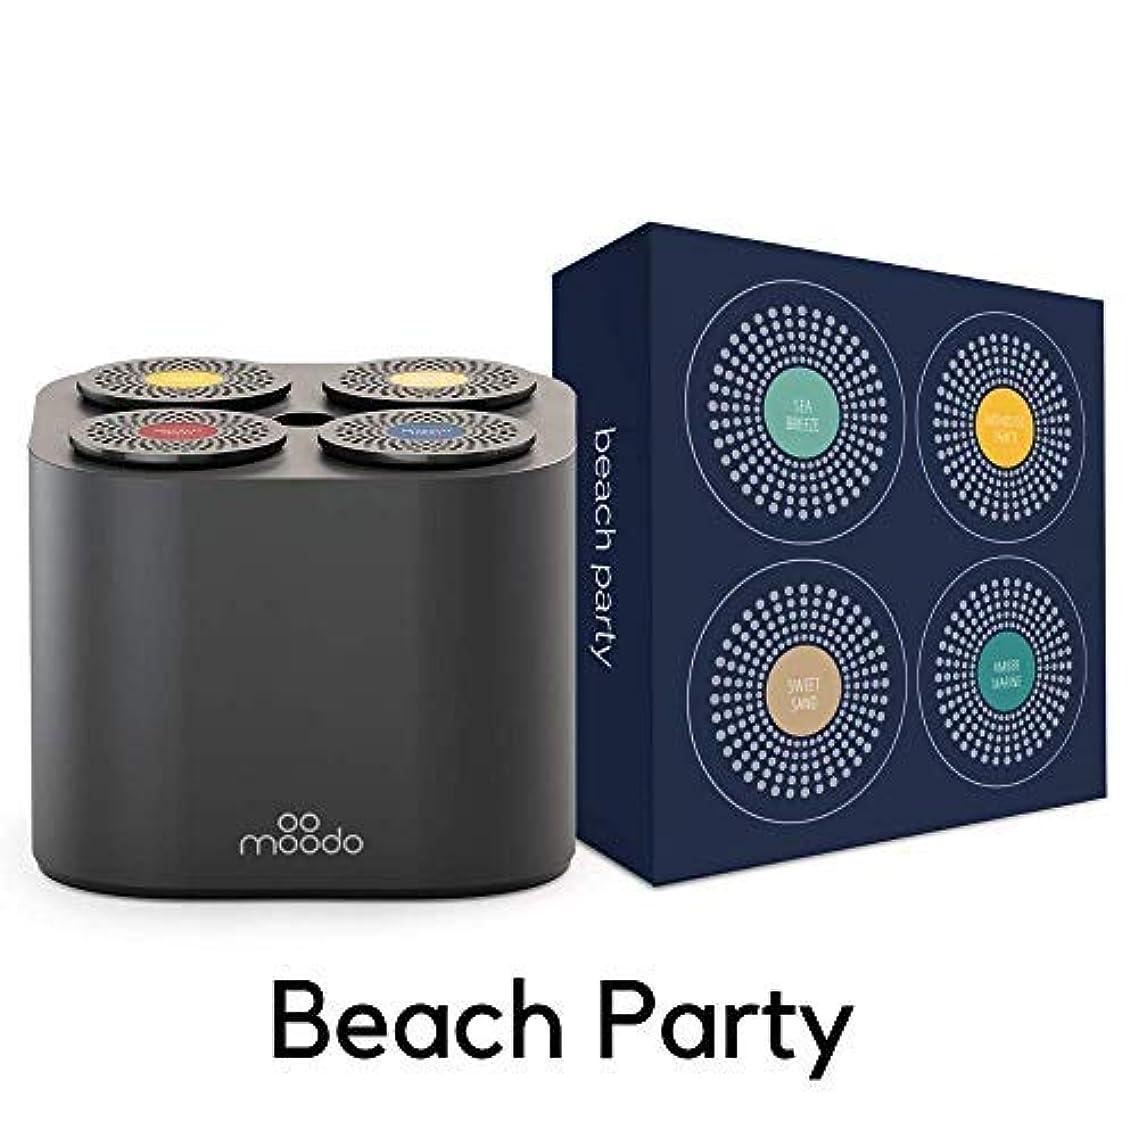 Moodo Smart Home Fragrance Diffuser Bundle with 1 Scent Capsules Sets (Junior Pack) - scent personalization, Alexa Compatible, includes 4 Scent Pod Refils, Black Moodo Junior Pack 2